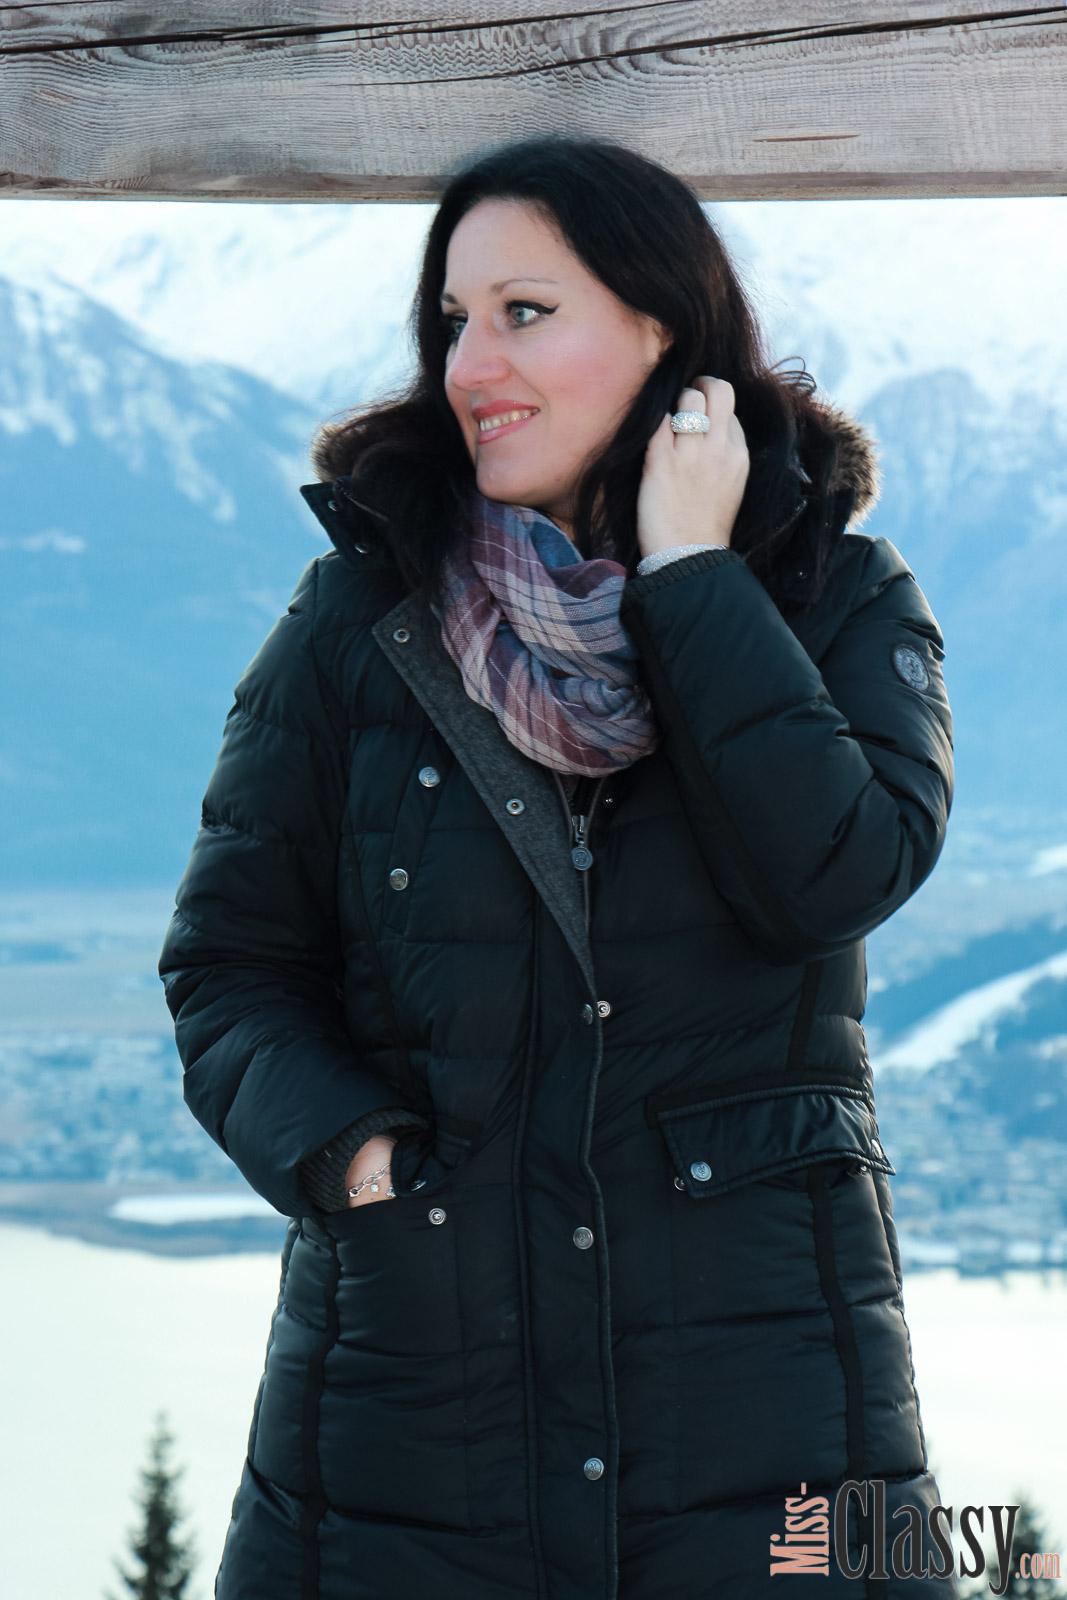 OUTFIT Winterjacke und Boots von Marco Polo, Miss Classy, missclassy, Winteroutfit, Fashionblog, Fashionblogger, Austria, Österreich, Graz, Zell am See, Thumersbach, Mitterberg, Zeller See, Liebe, Love, Mister Classy, Bilderrahmen